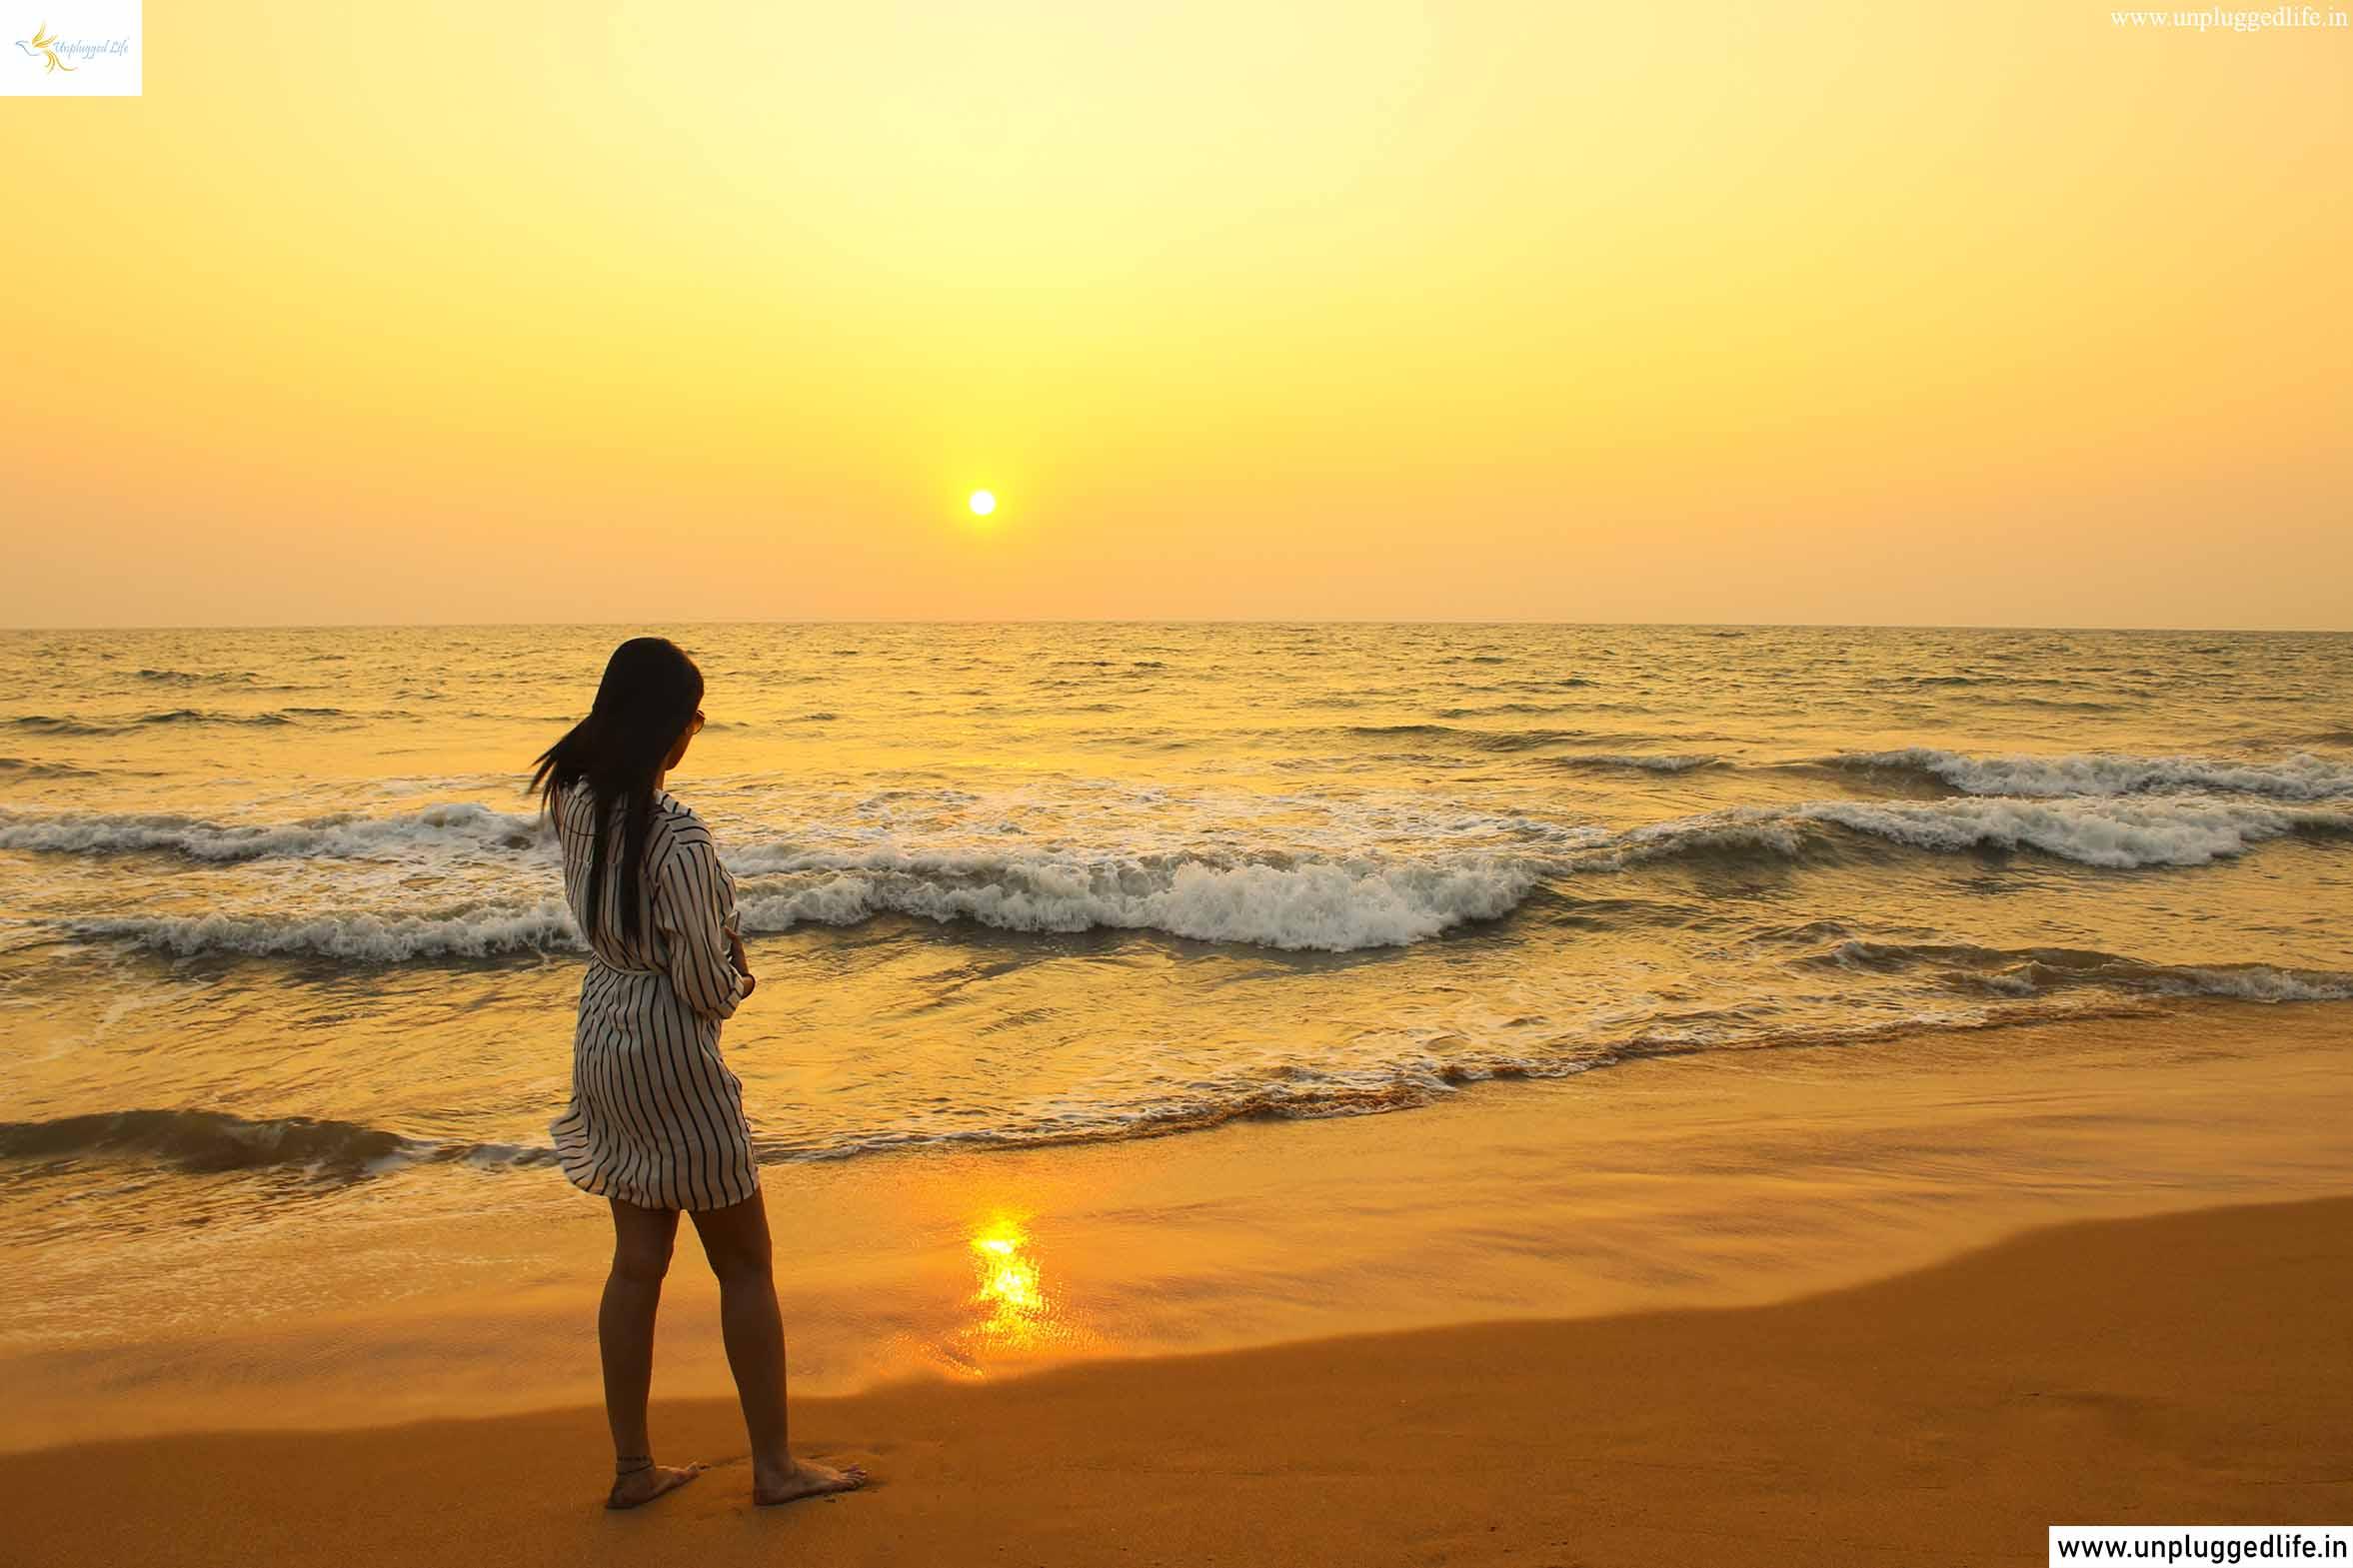 Bentota Beach, Sri Lanka, Unplugged Life, Indian Ocean, Laccadive Sea, Beach, Sandy Beach